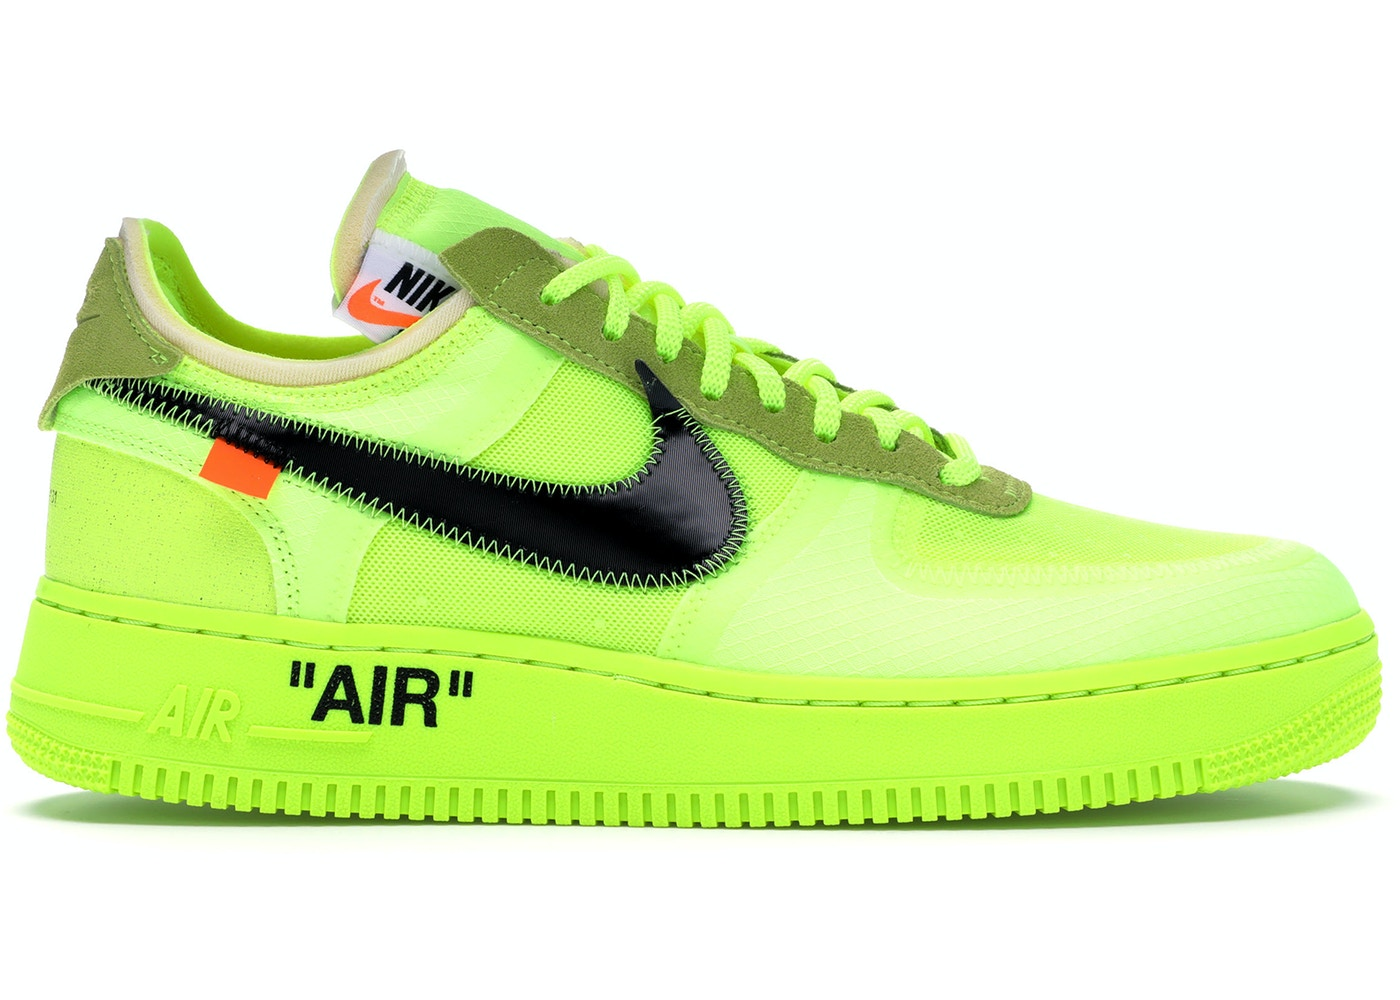 Cierto Previamente pureza  Nike Air Force 1 Low Off-White Volt - AO4606-700